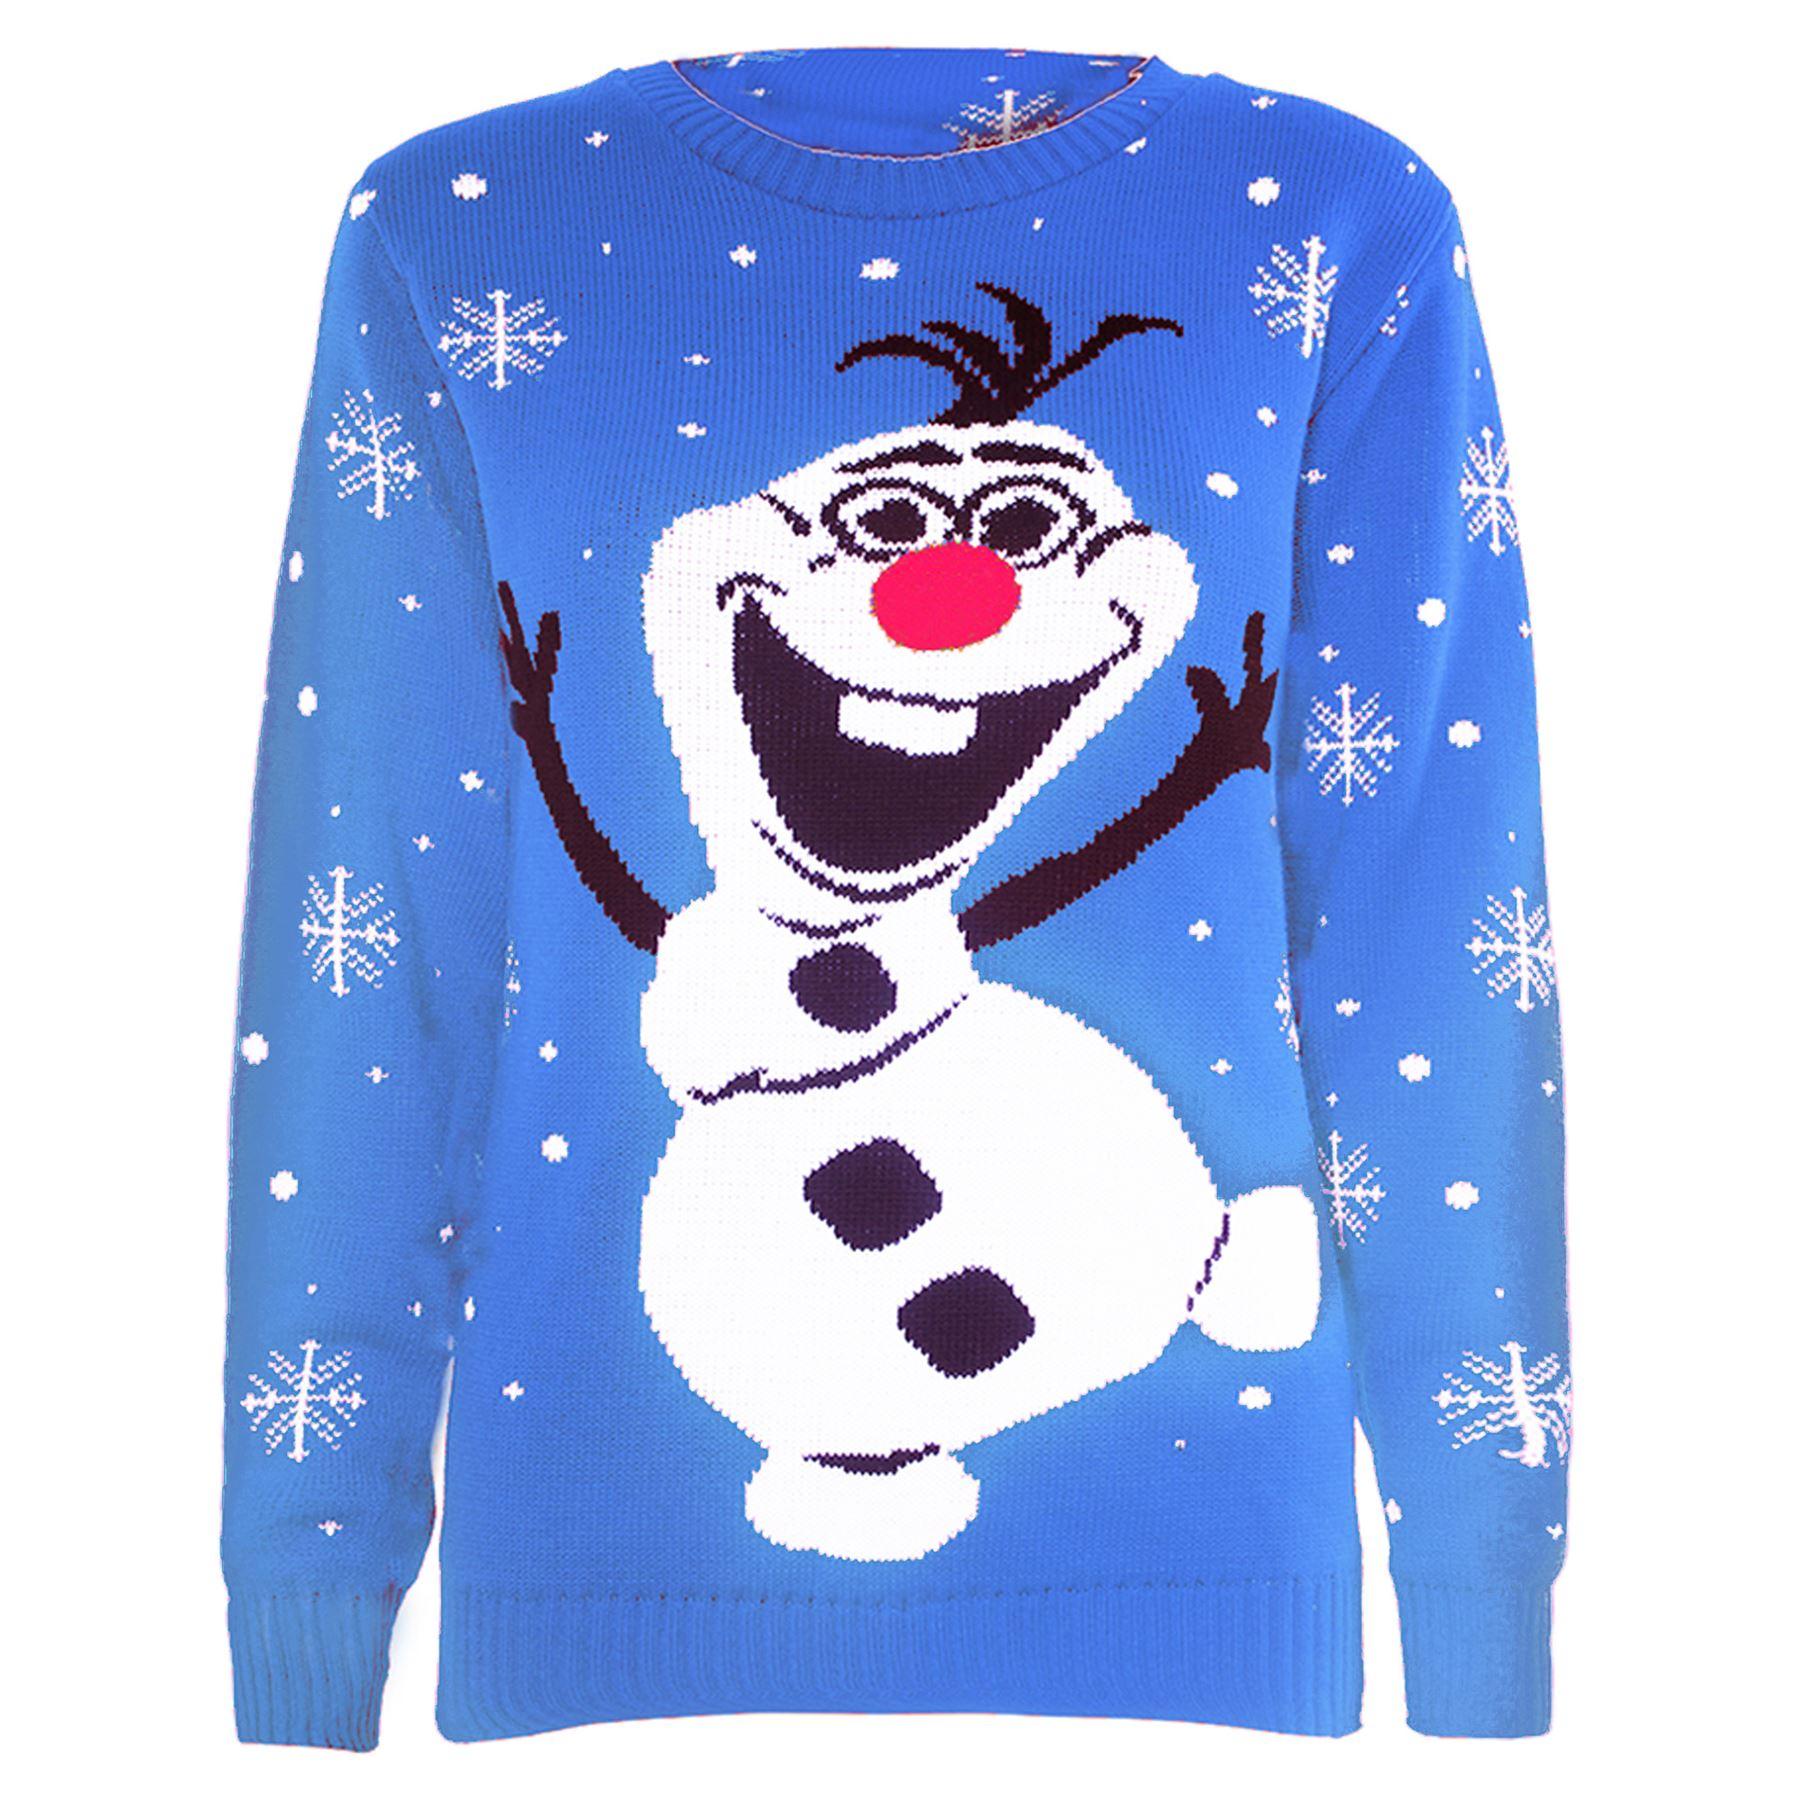 children kids unisex boy girl women ladies olaf frozen minion christmas xmas jumper sweater plus size - Minion Christmas Sweater